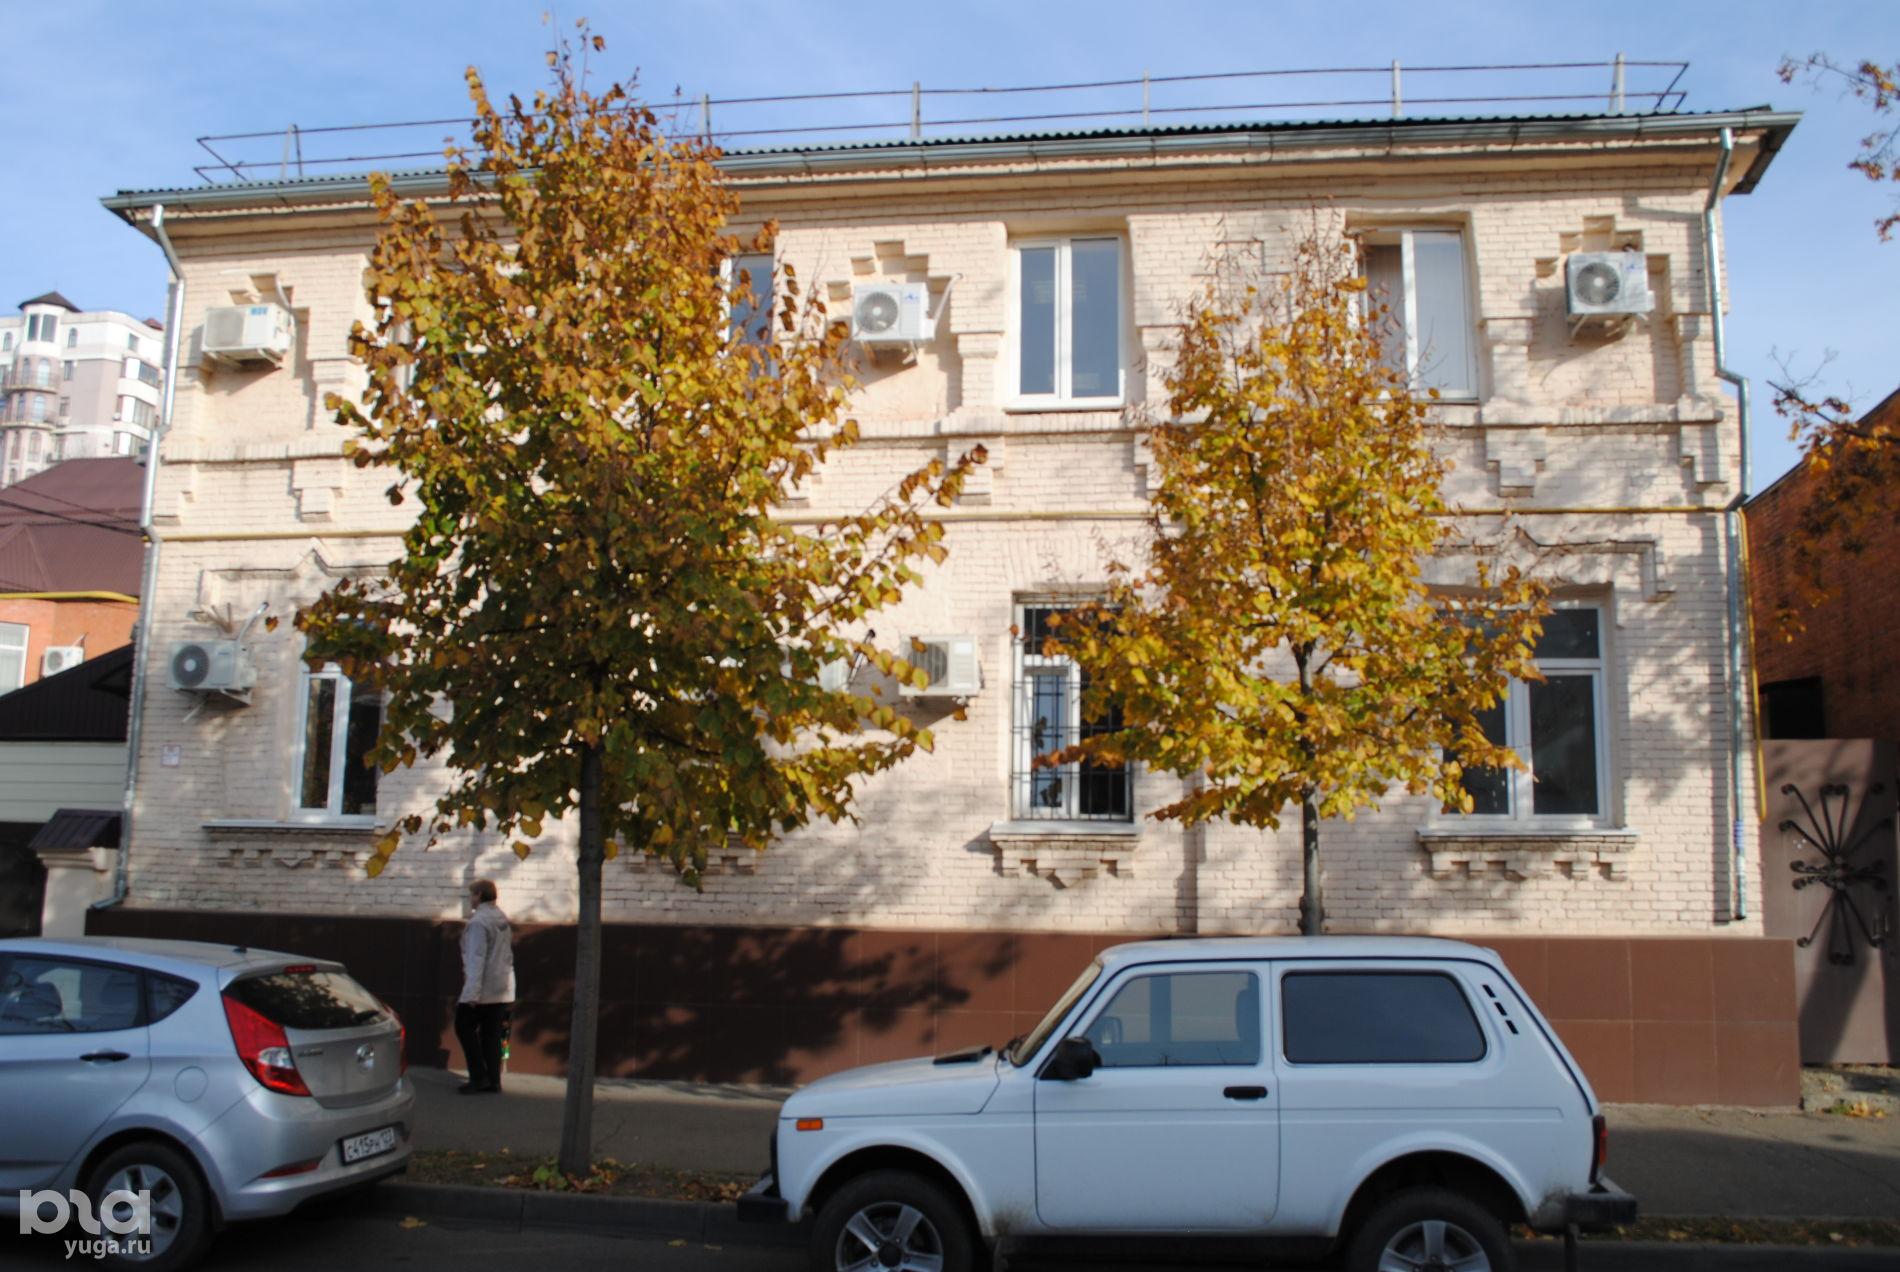 Историческое здание синагоги, ул. Ленина, 39 ©Фото Виктора Дерезы, Юга.ру